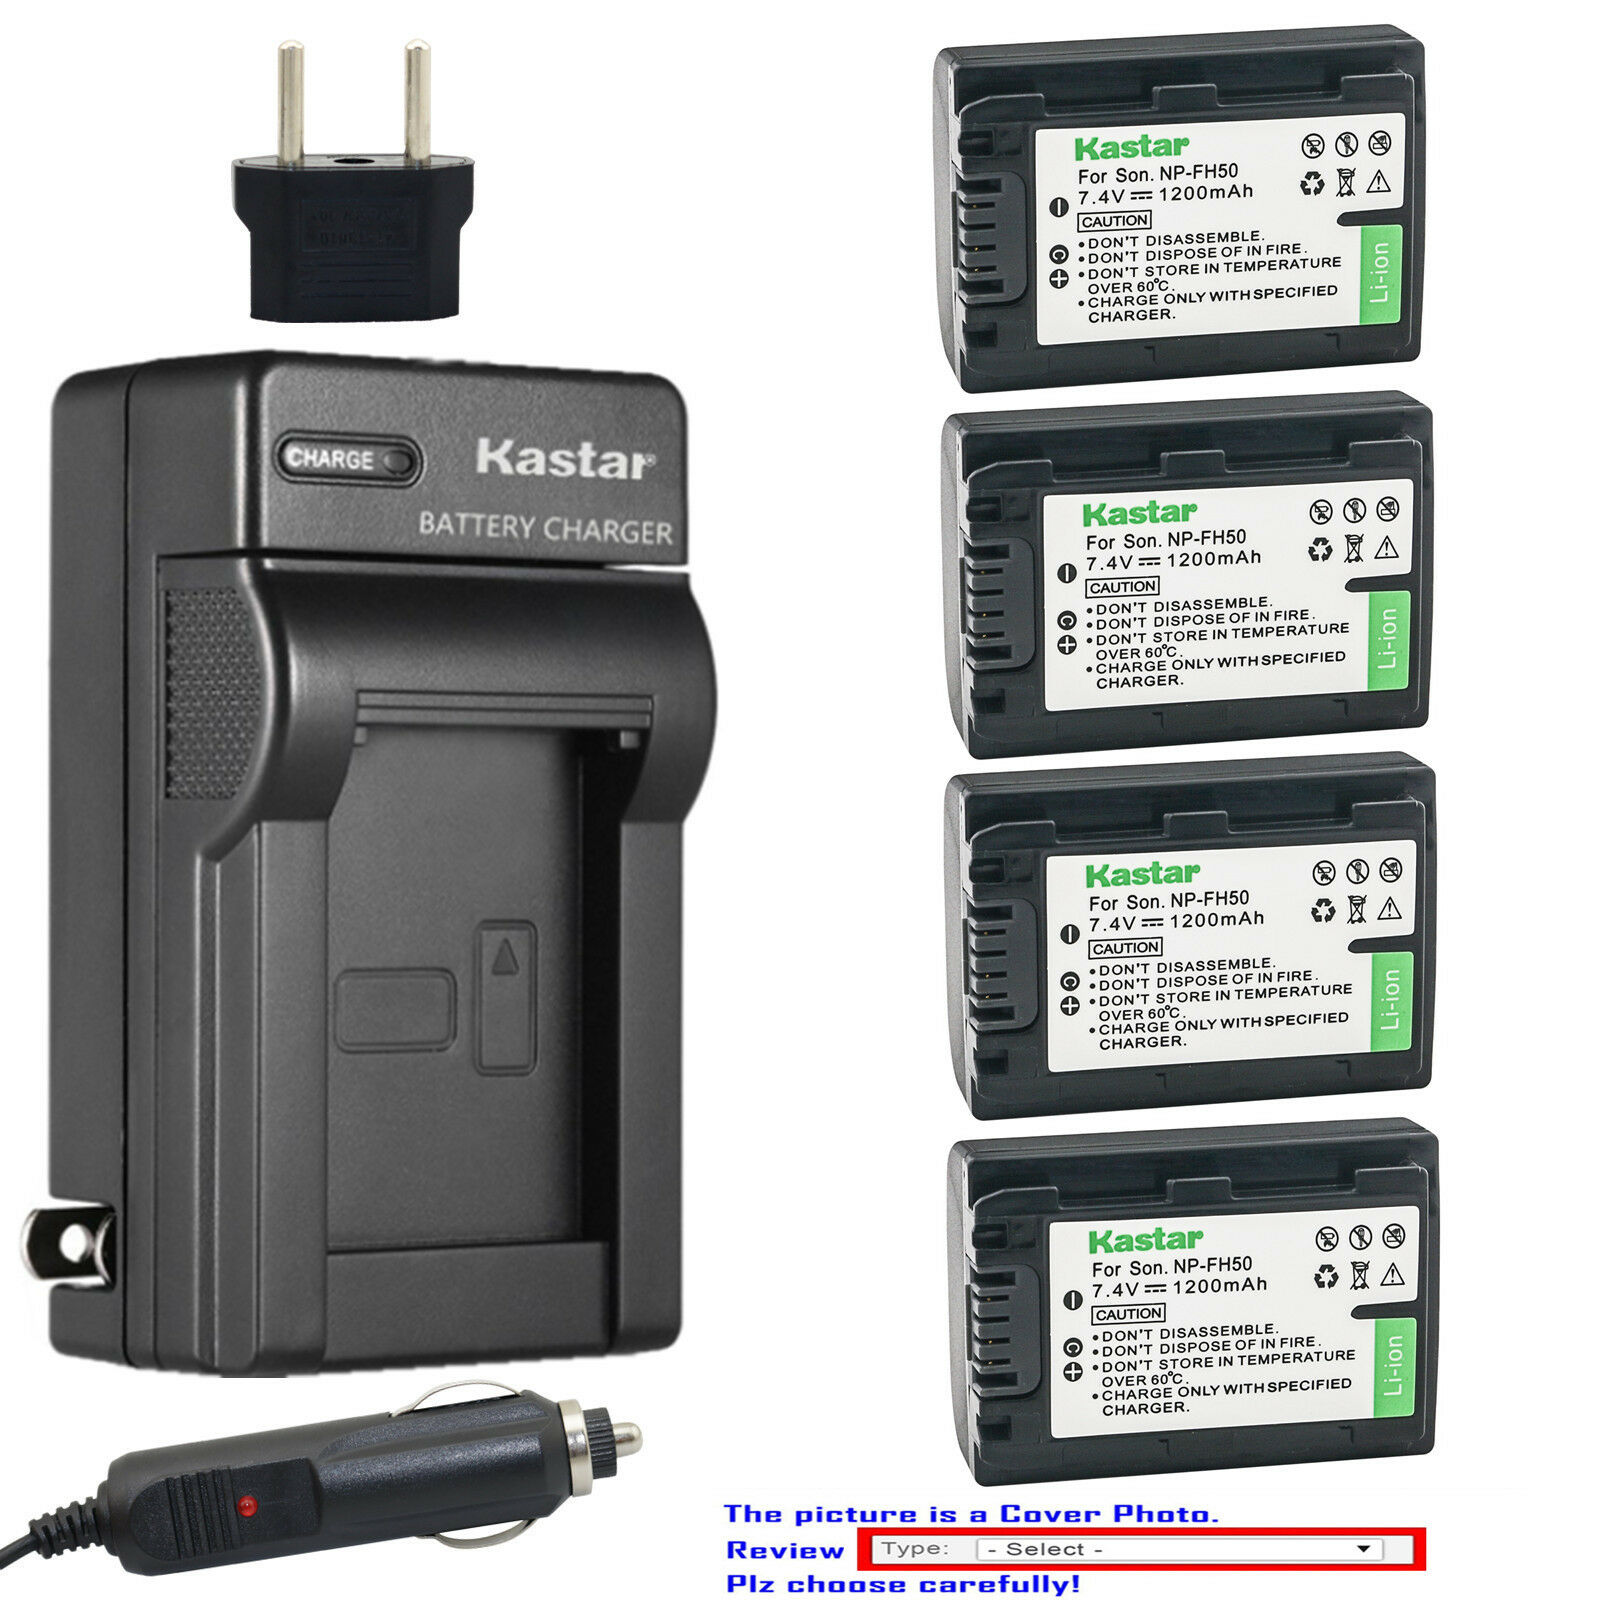 Sony DCR-HC45E Sony DCRHC38E Sony DCR-HC45 Sony DCR-SR88E Two 2 UV Filters for Sony DCRHC38E